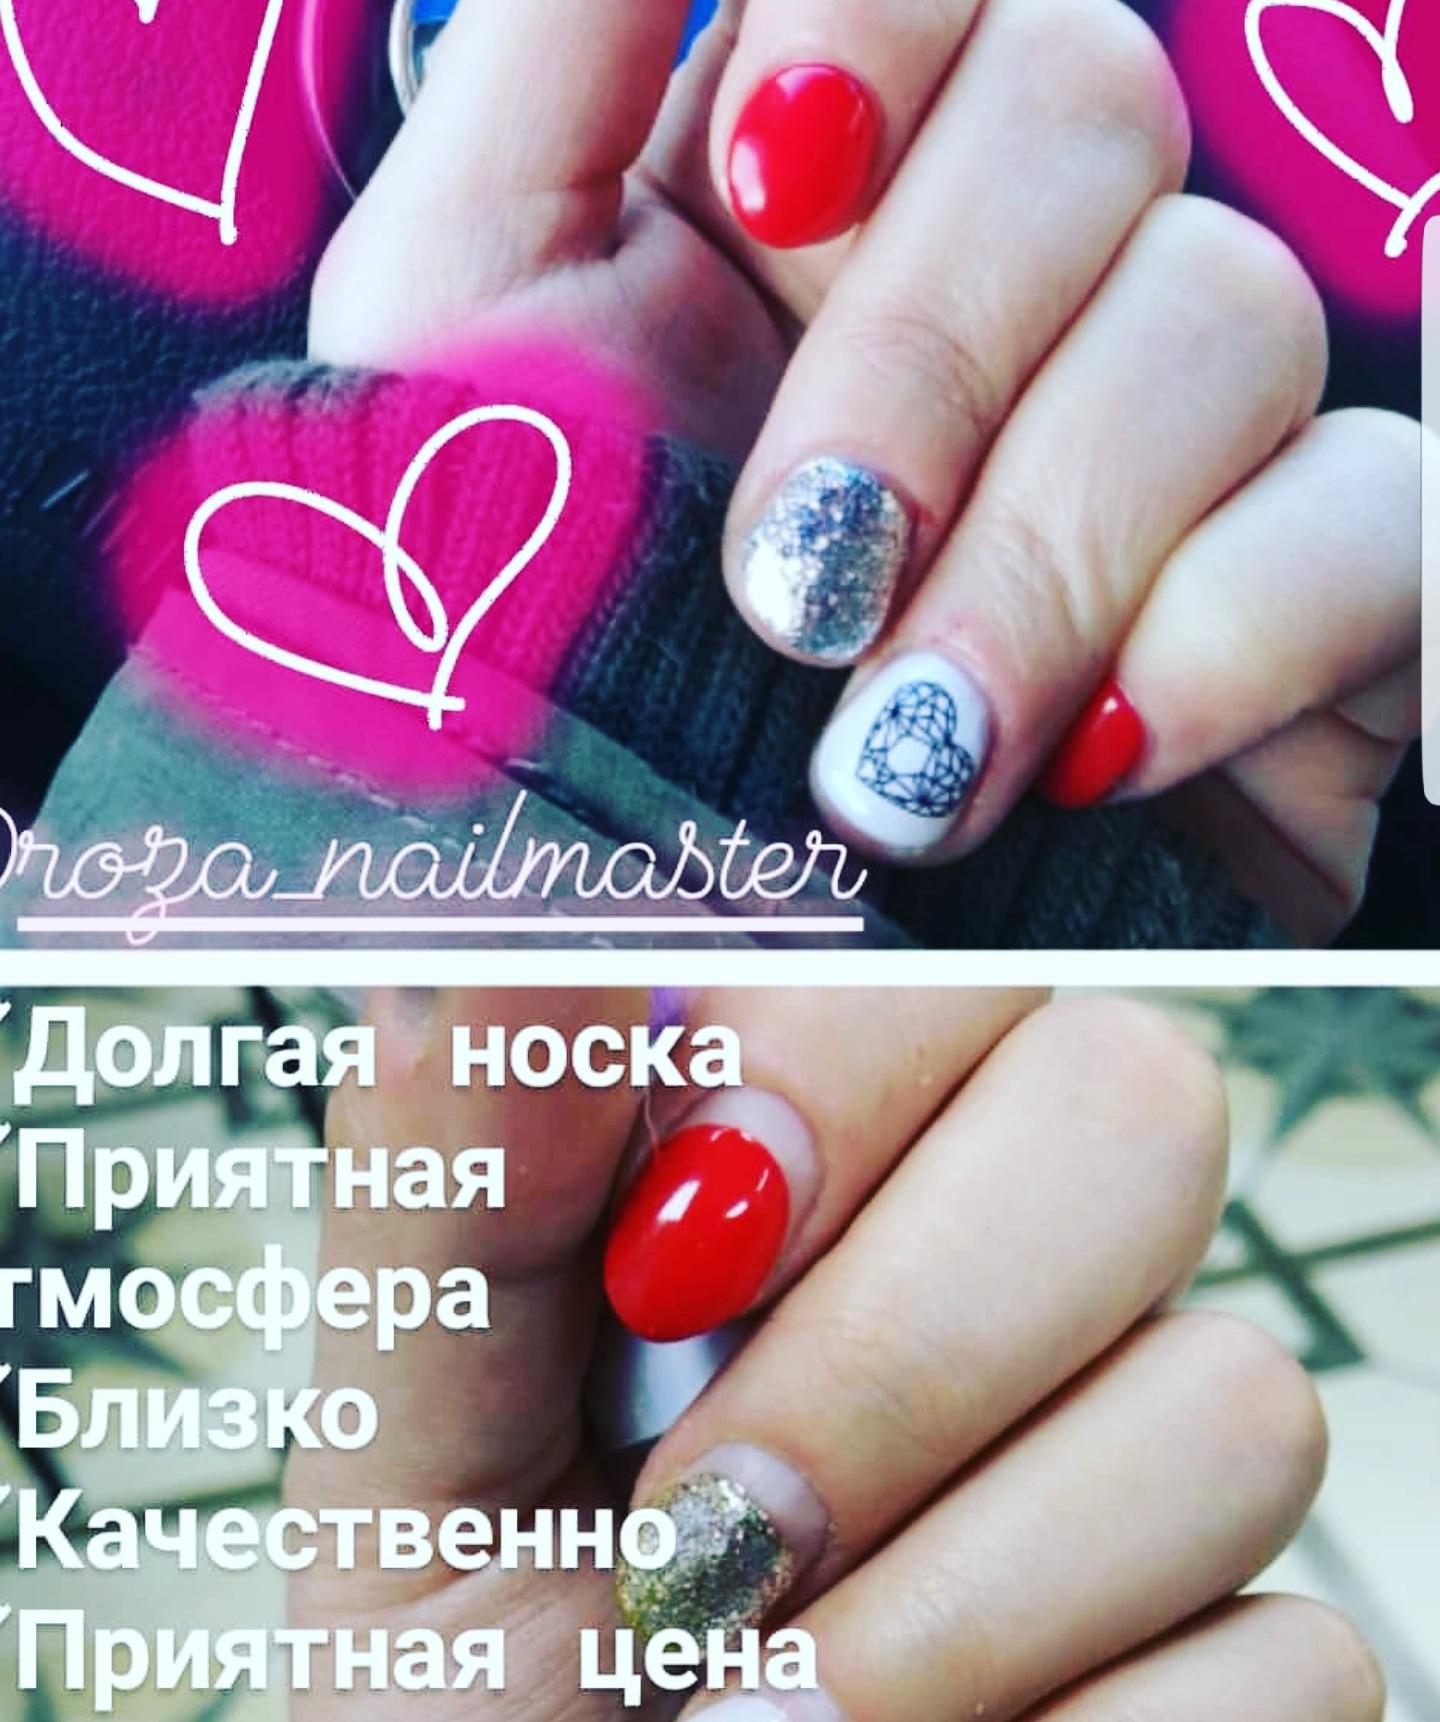 IMG_20180329_155300_025